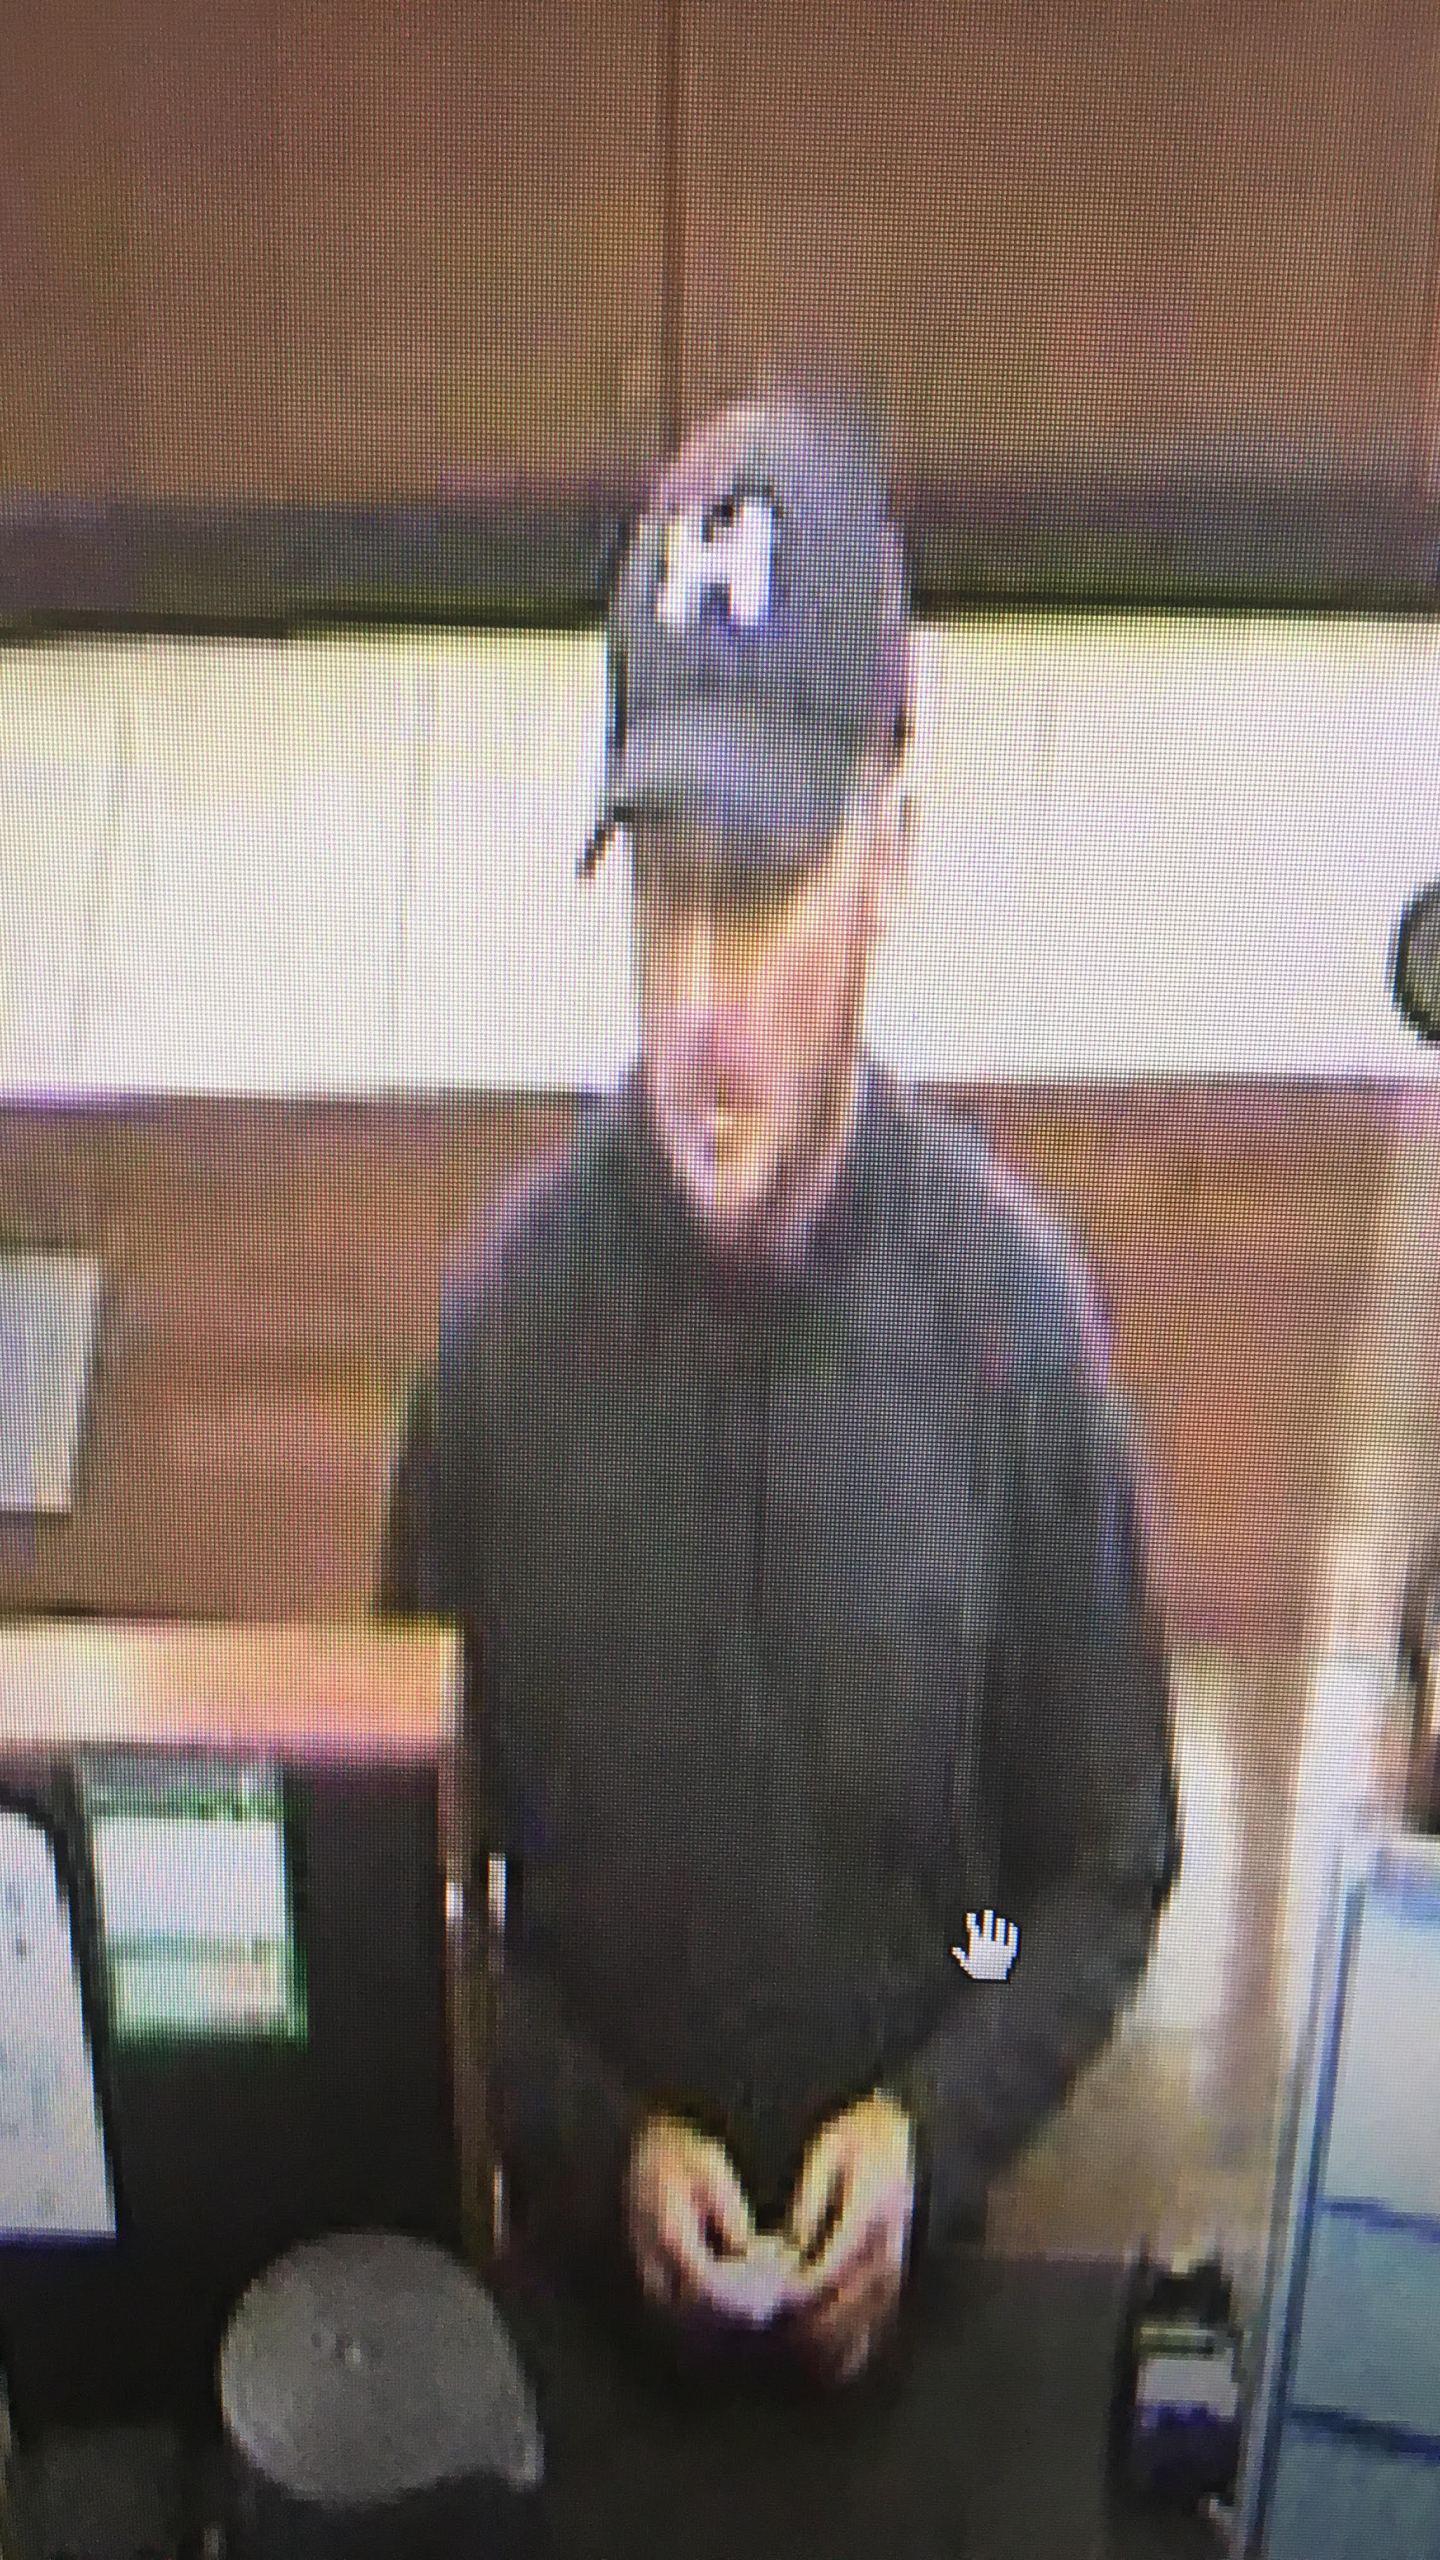 robbery suspect_1528343563893.jpg.jpg